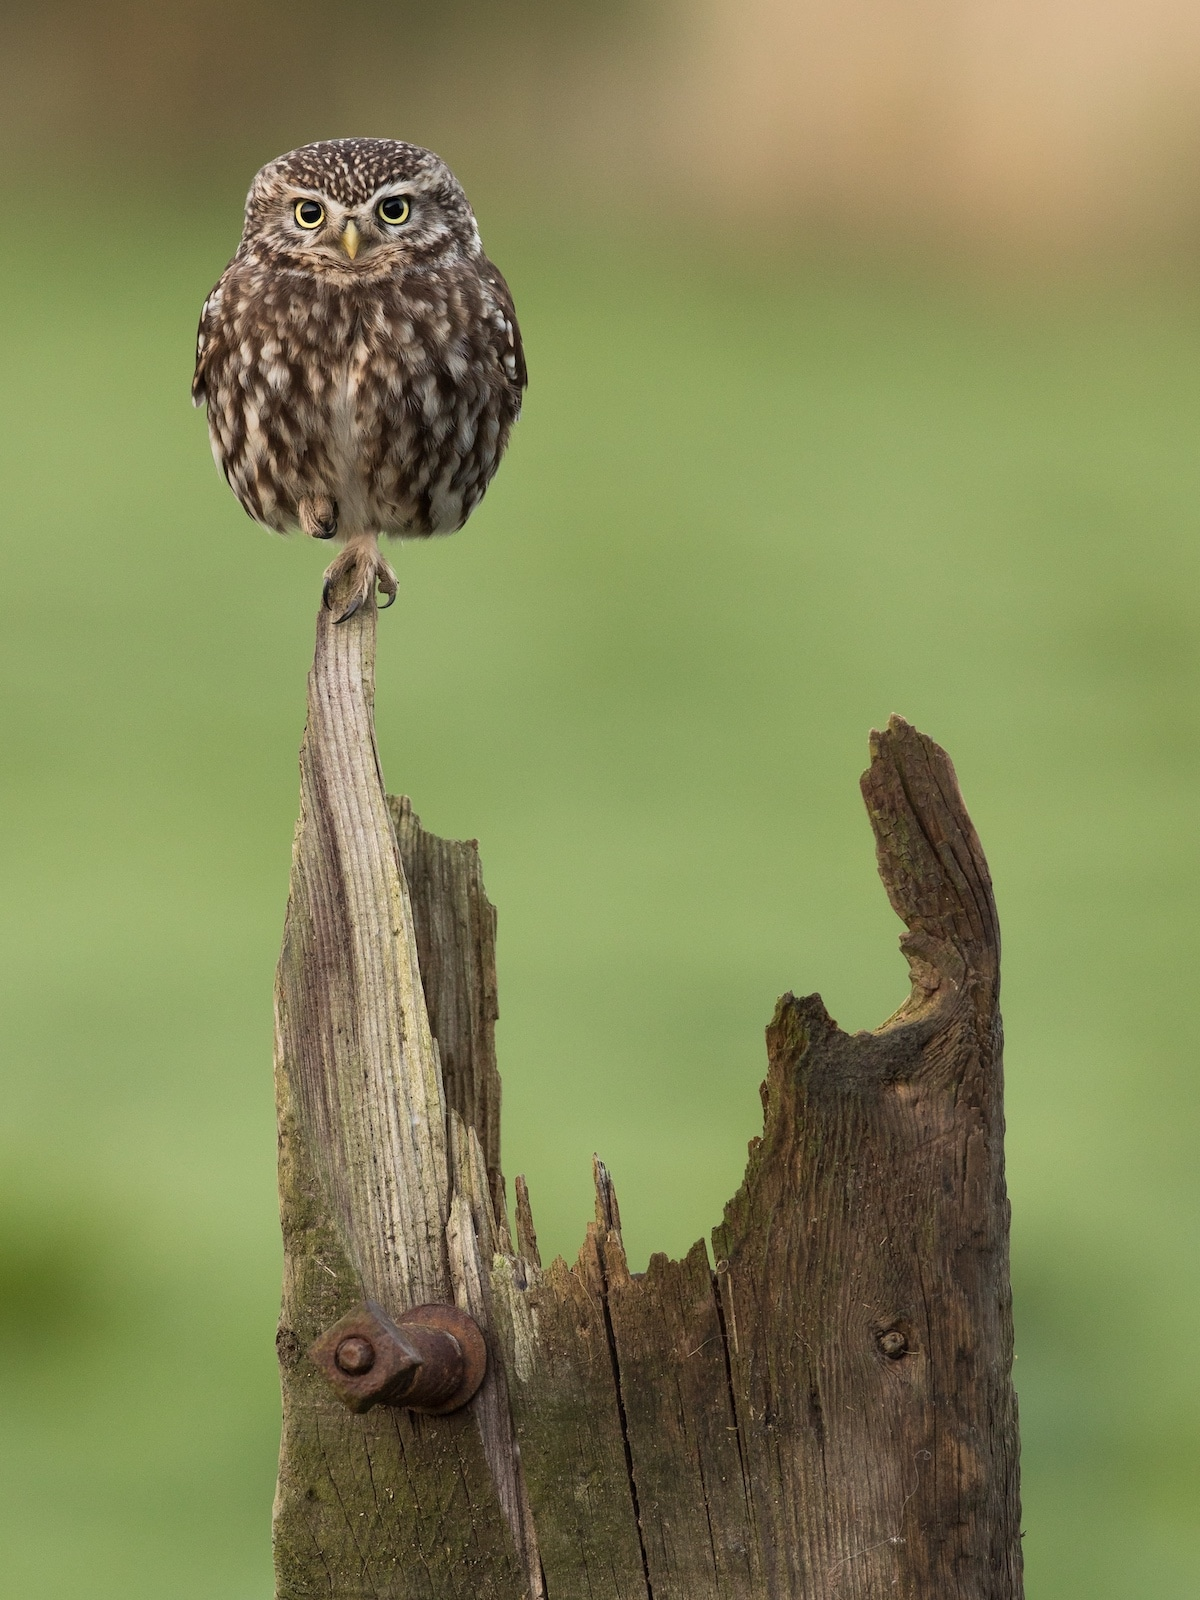 Little Owl Balancing on a Wood Pole